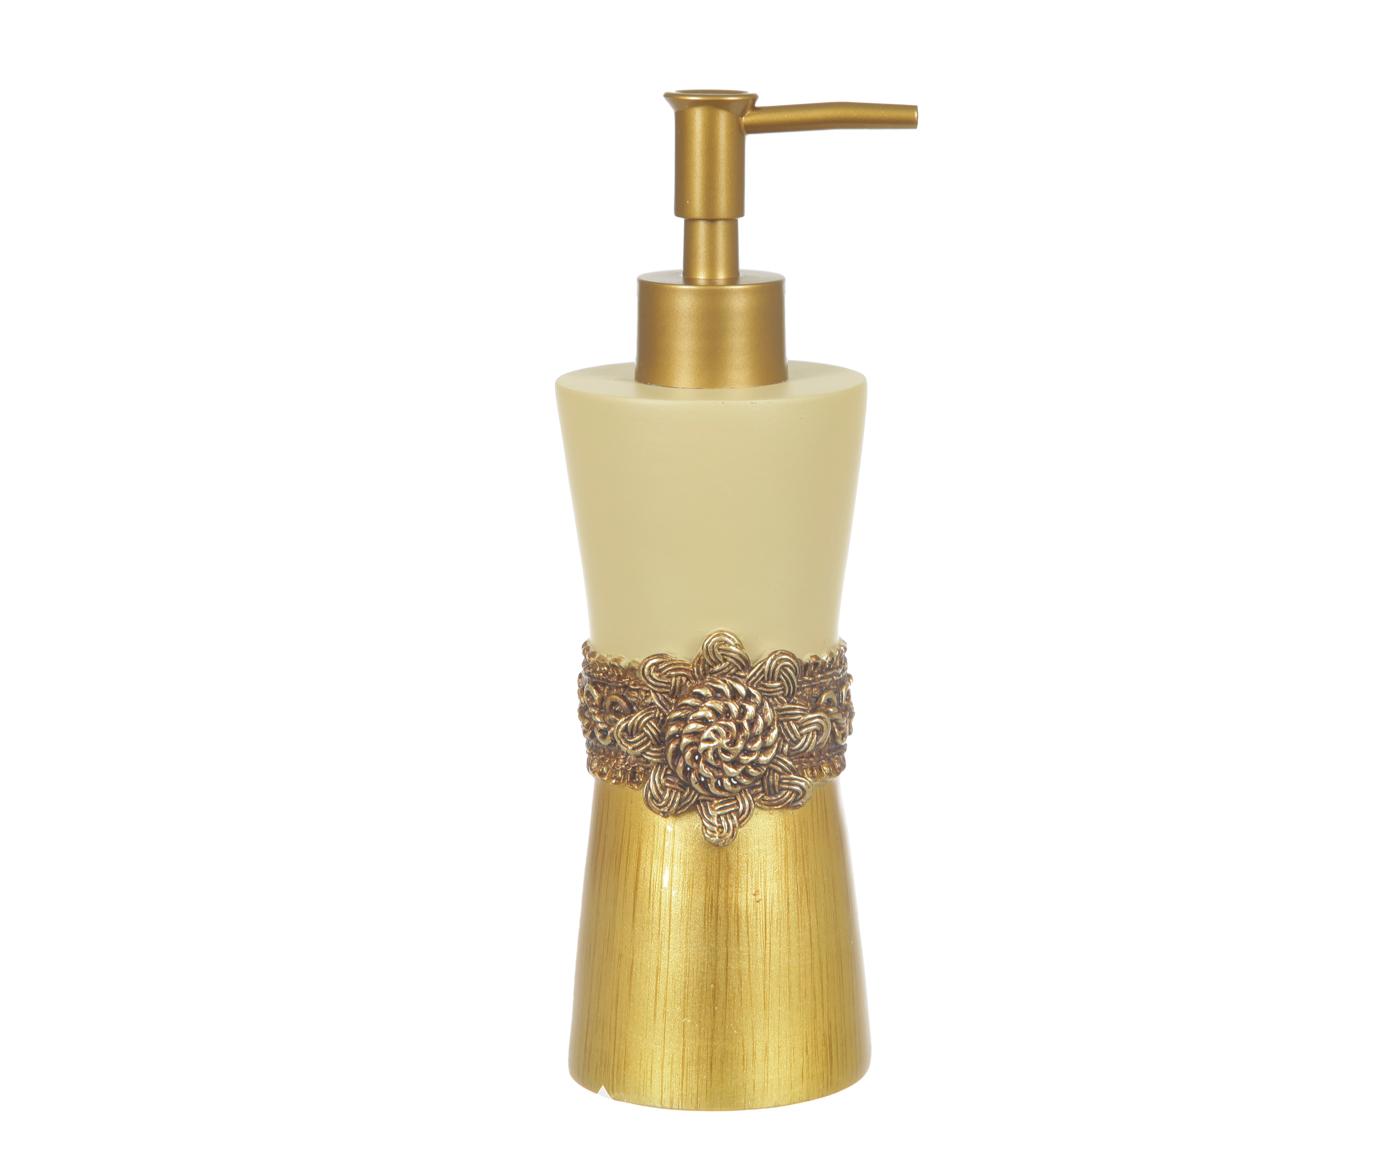 Дозаторы для мыла Дозатор для жидкого мыла Avanti Braided Medallion dozator-dlya-zhidkogo-myla-braided-medallion-ot-avanti-ssha-kitay.jpg